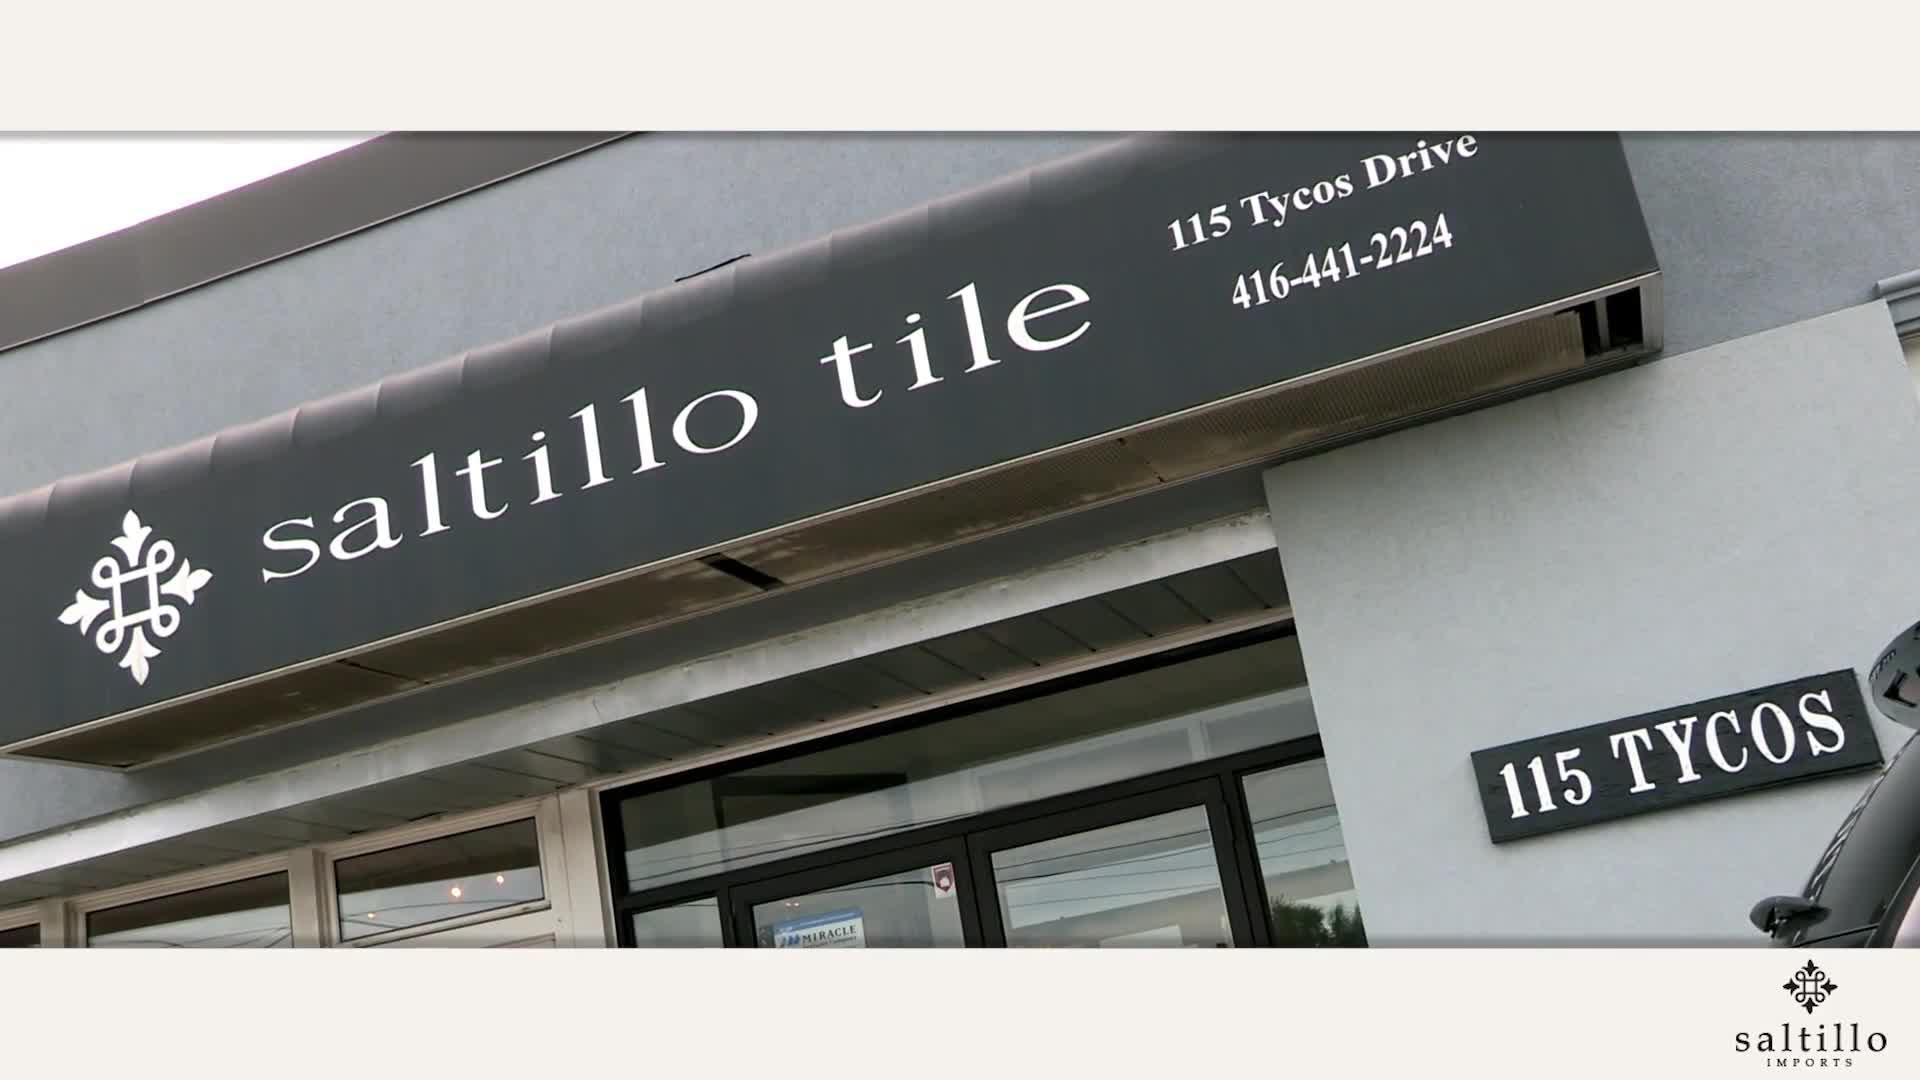 Saltillo Imports Inc - Ceramic Tile Dealers - 4164412224